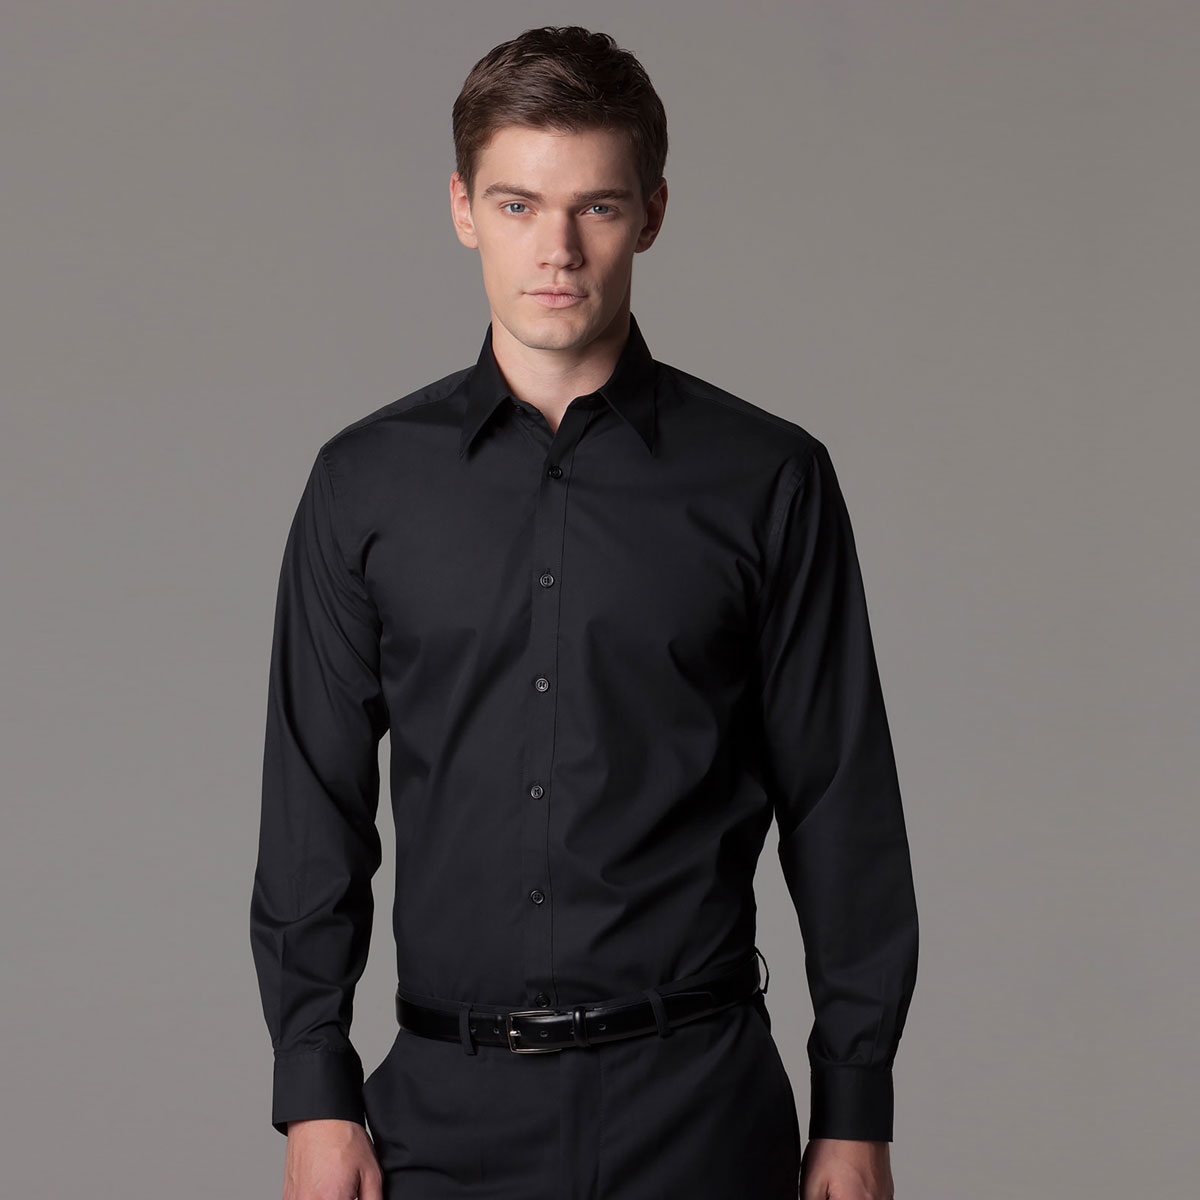 Hospitality Shirt Long Sleeve - KK121